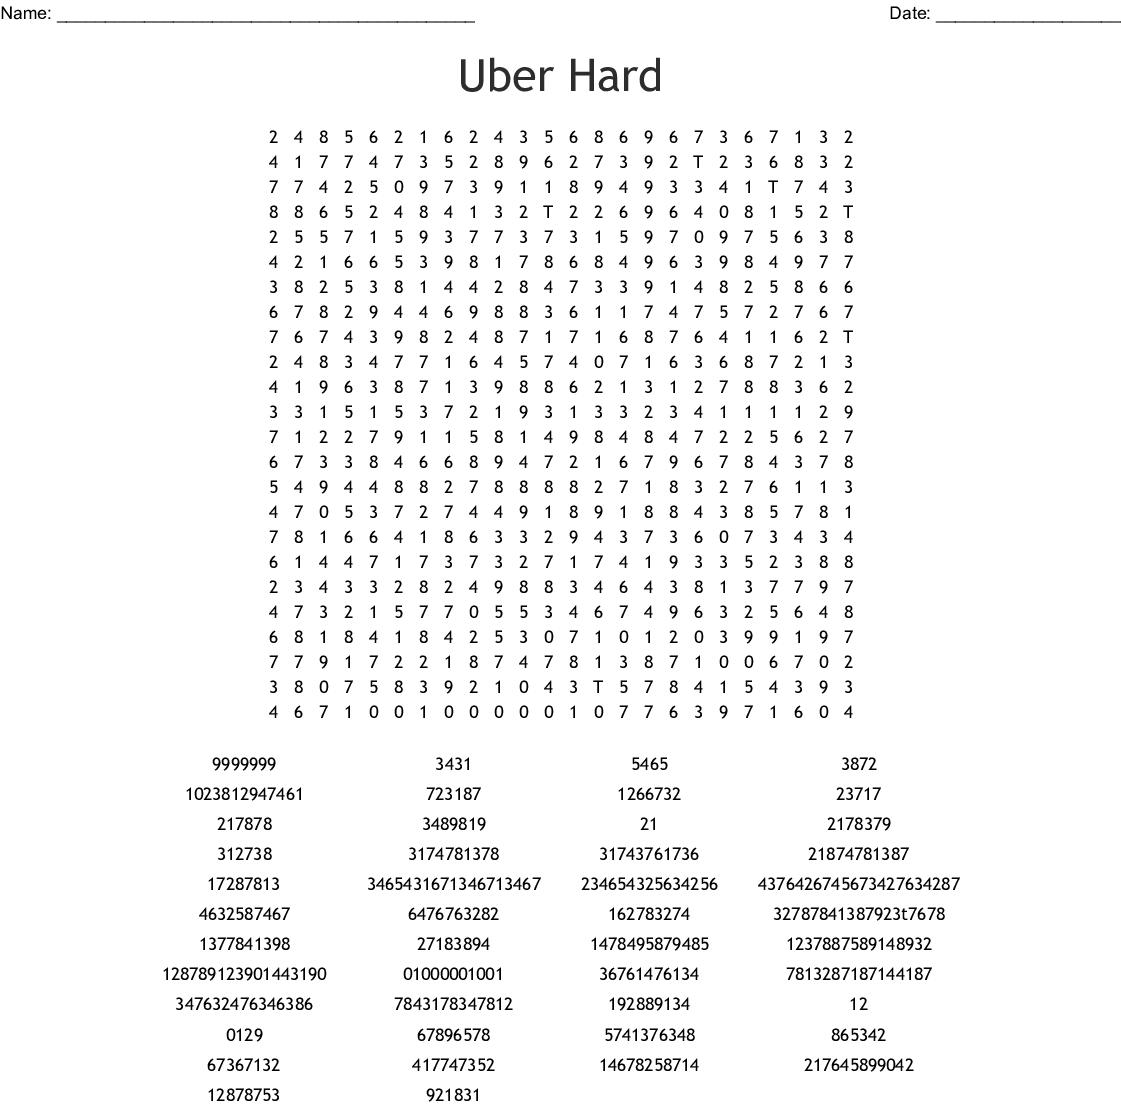 Uber Hard Word Search